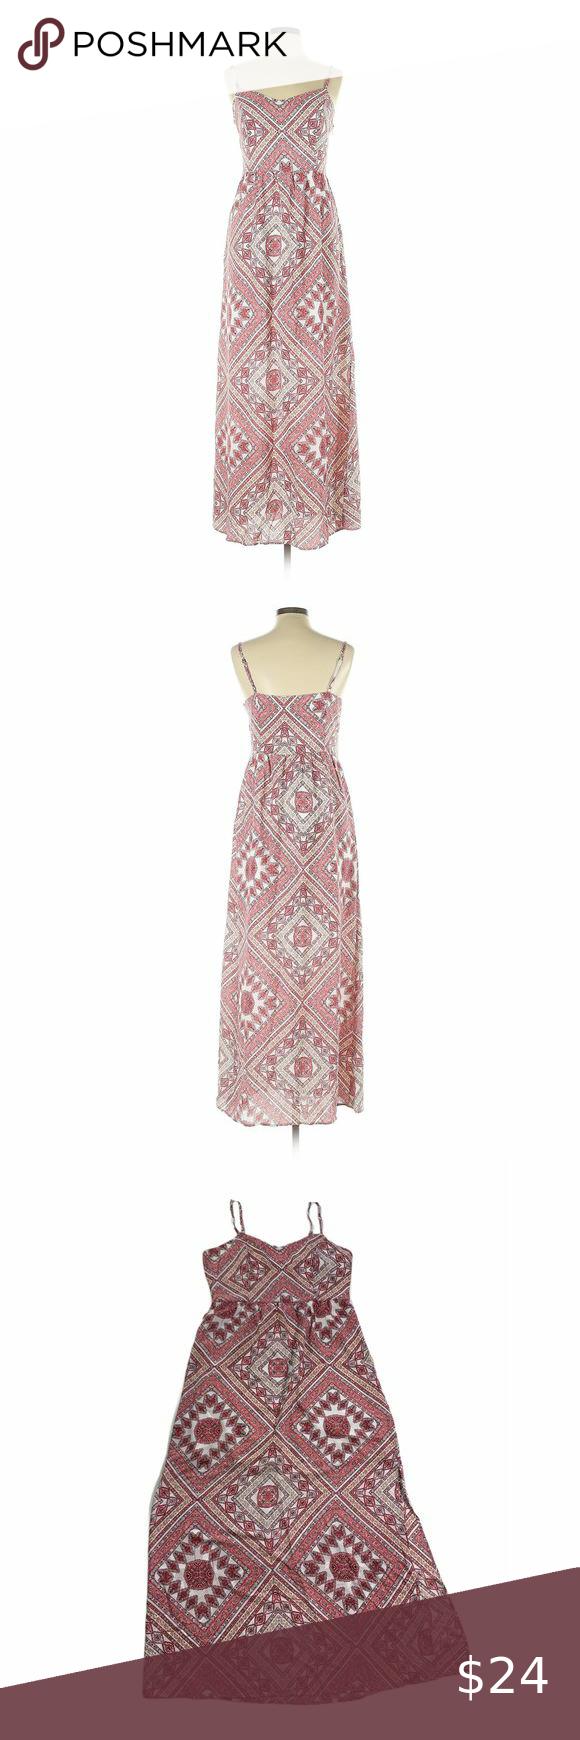 Altar D State Summer Sundress Maxi Large Chevron Red Pink Lined Maxi Dress By Altar D State With A Boho Styl Maxi Sundress Altard State Dresses Summer Sundress [ 1740 x 580 Pixel ]